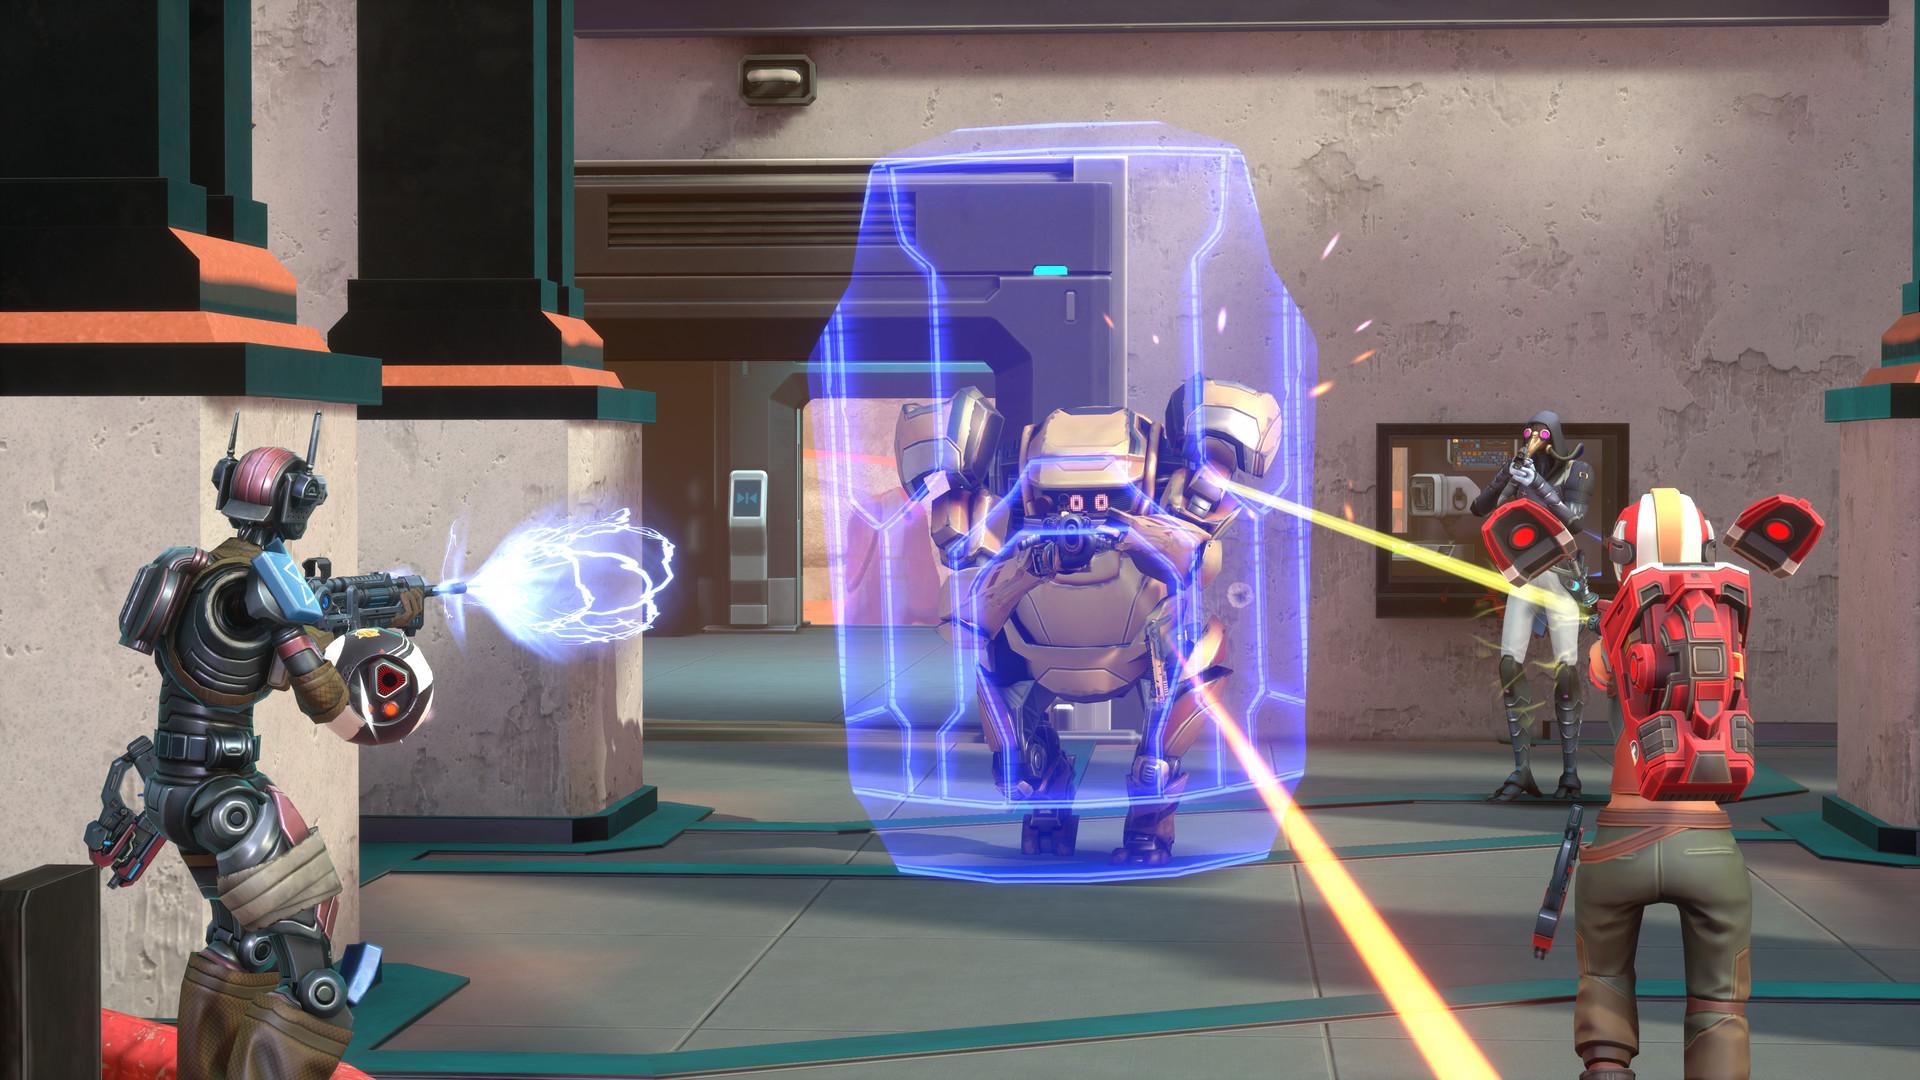 Oculus Quest 游戏《Larcenauts vr》盗贼 ~ 守望先锋插图(2)